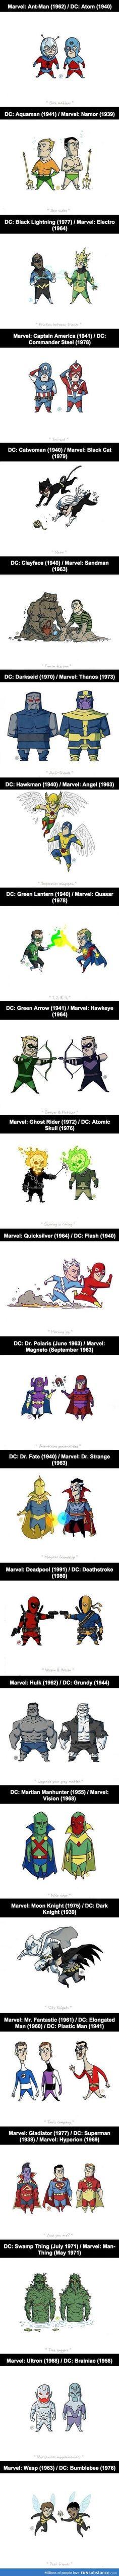 DC vs Marvel: Similar Characters